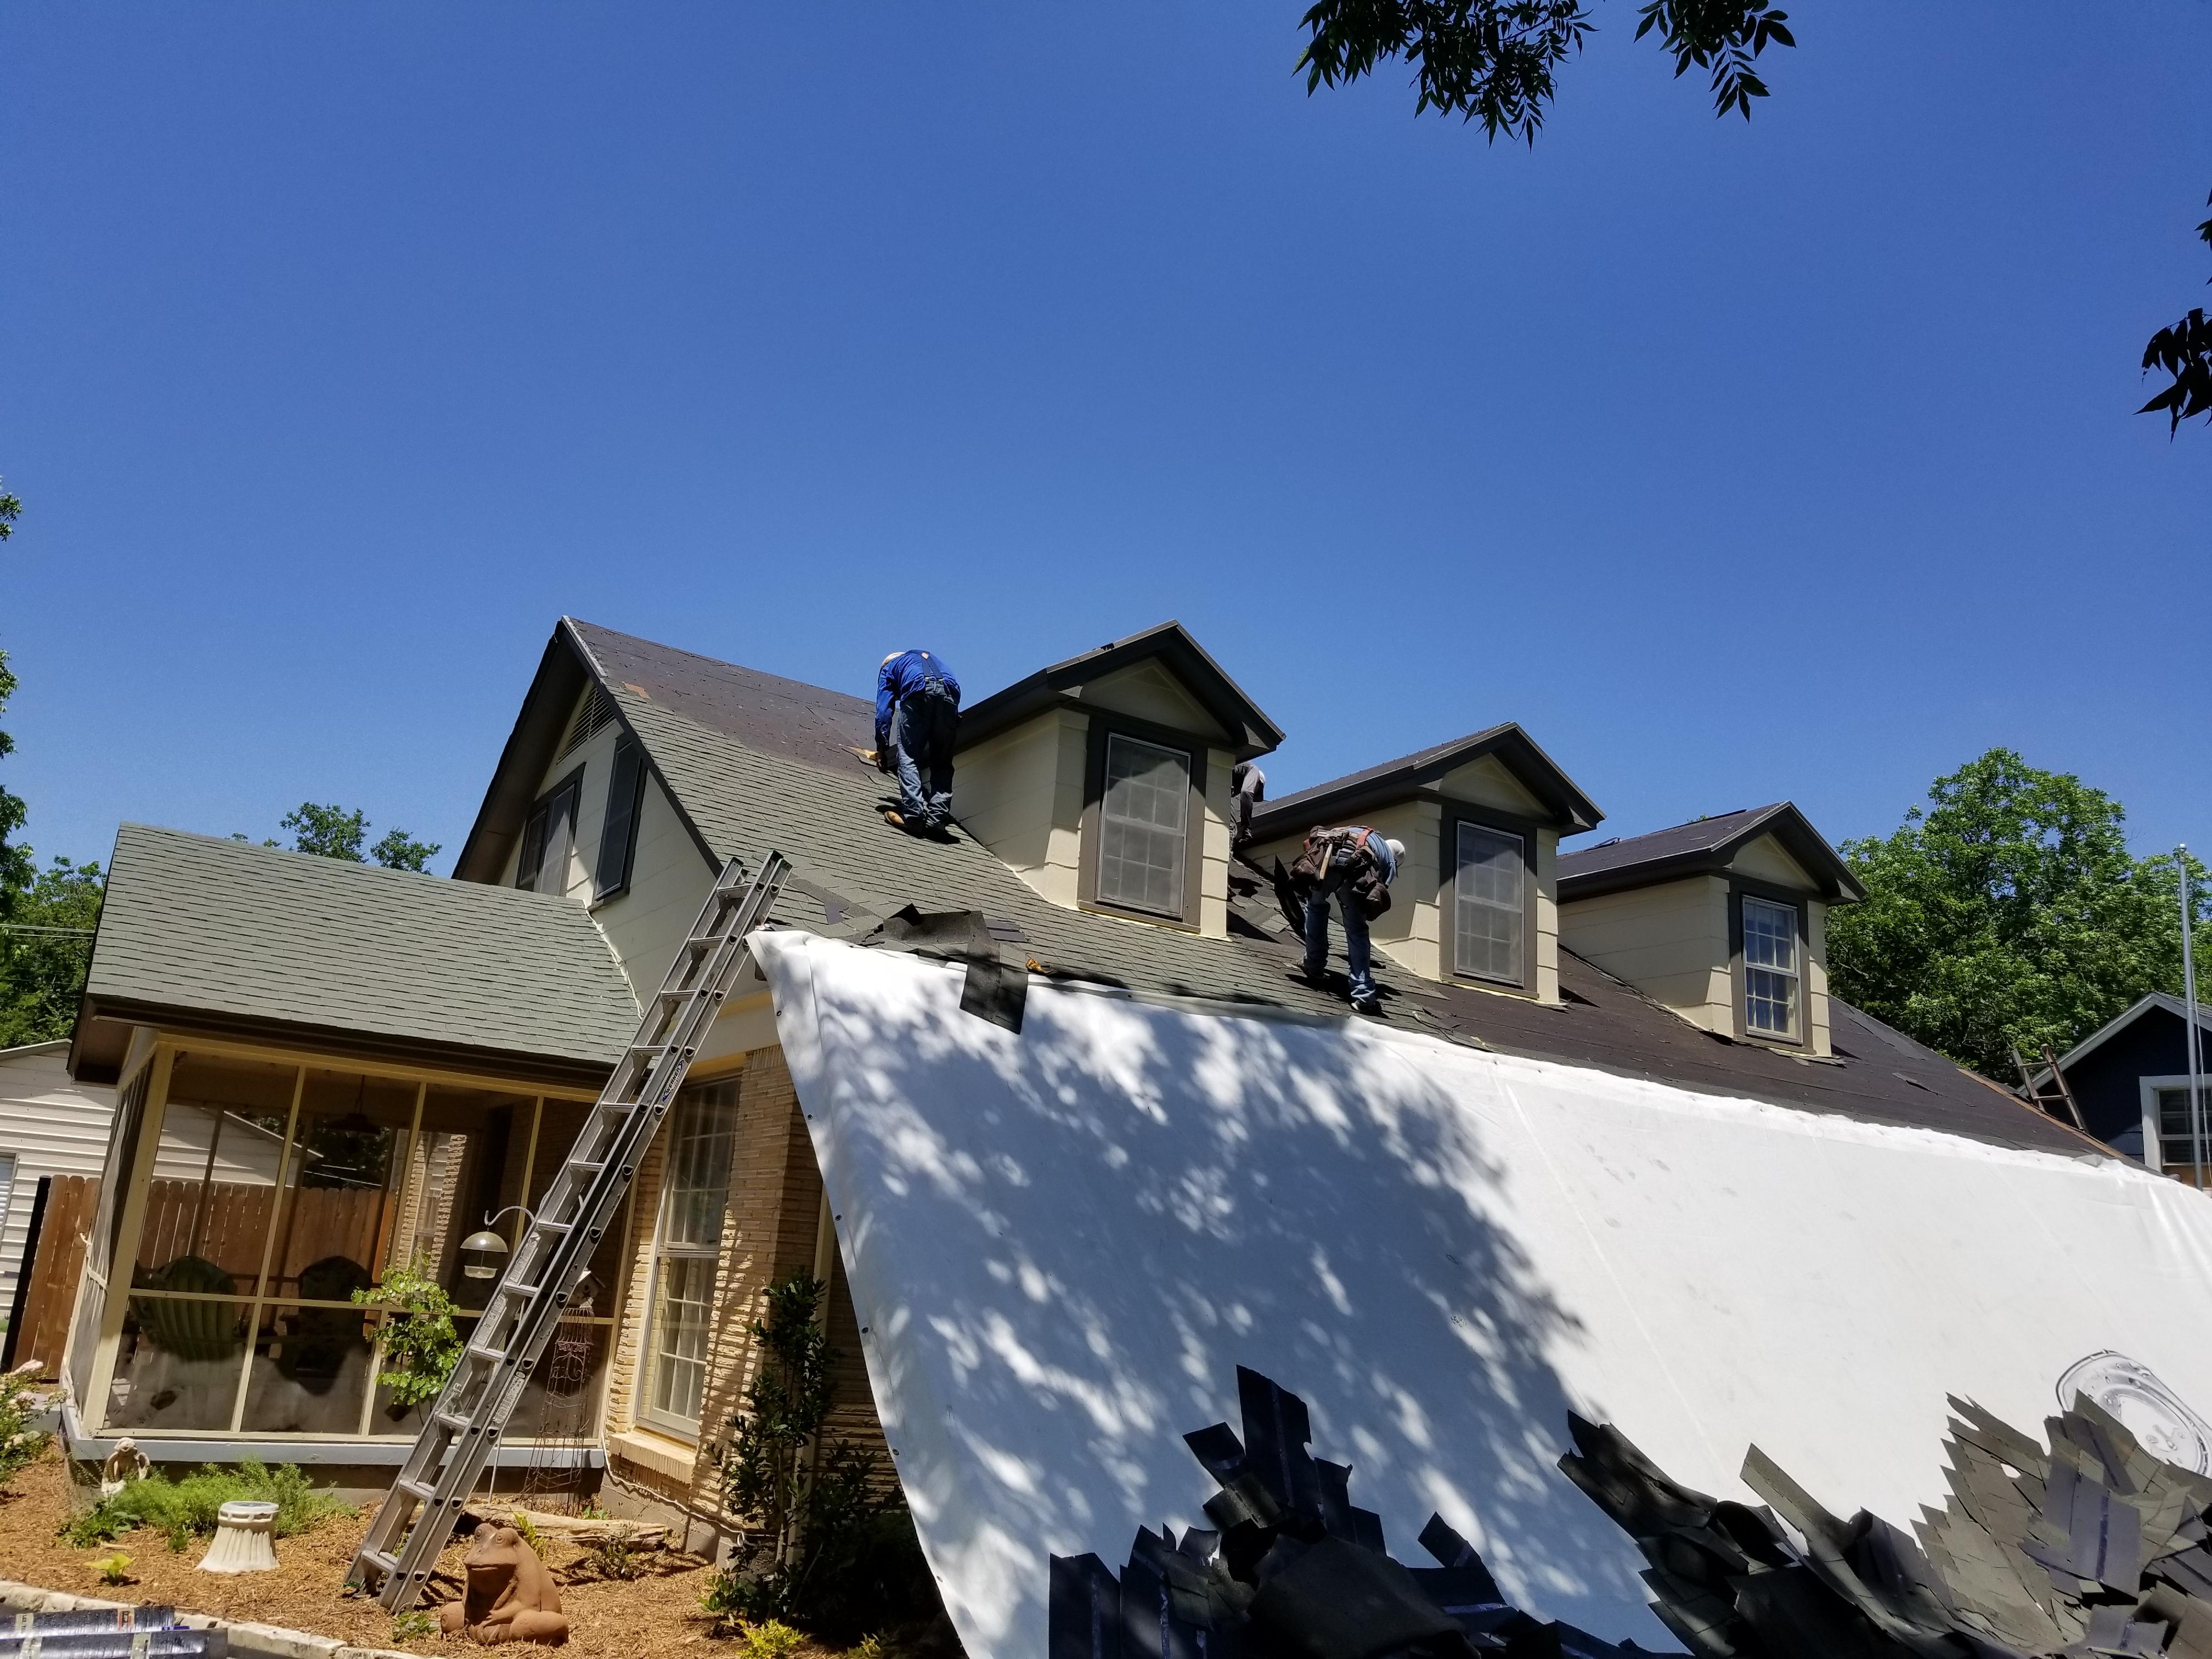 Stevan Buren Roofing, Windows, and Flooring image 1